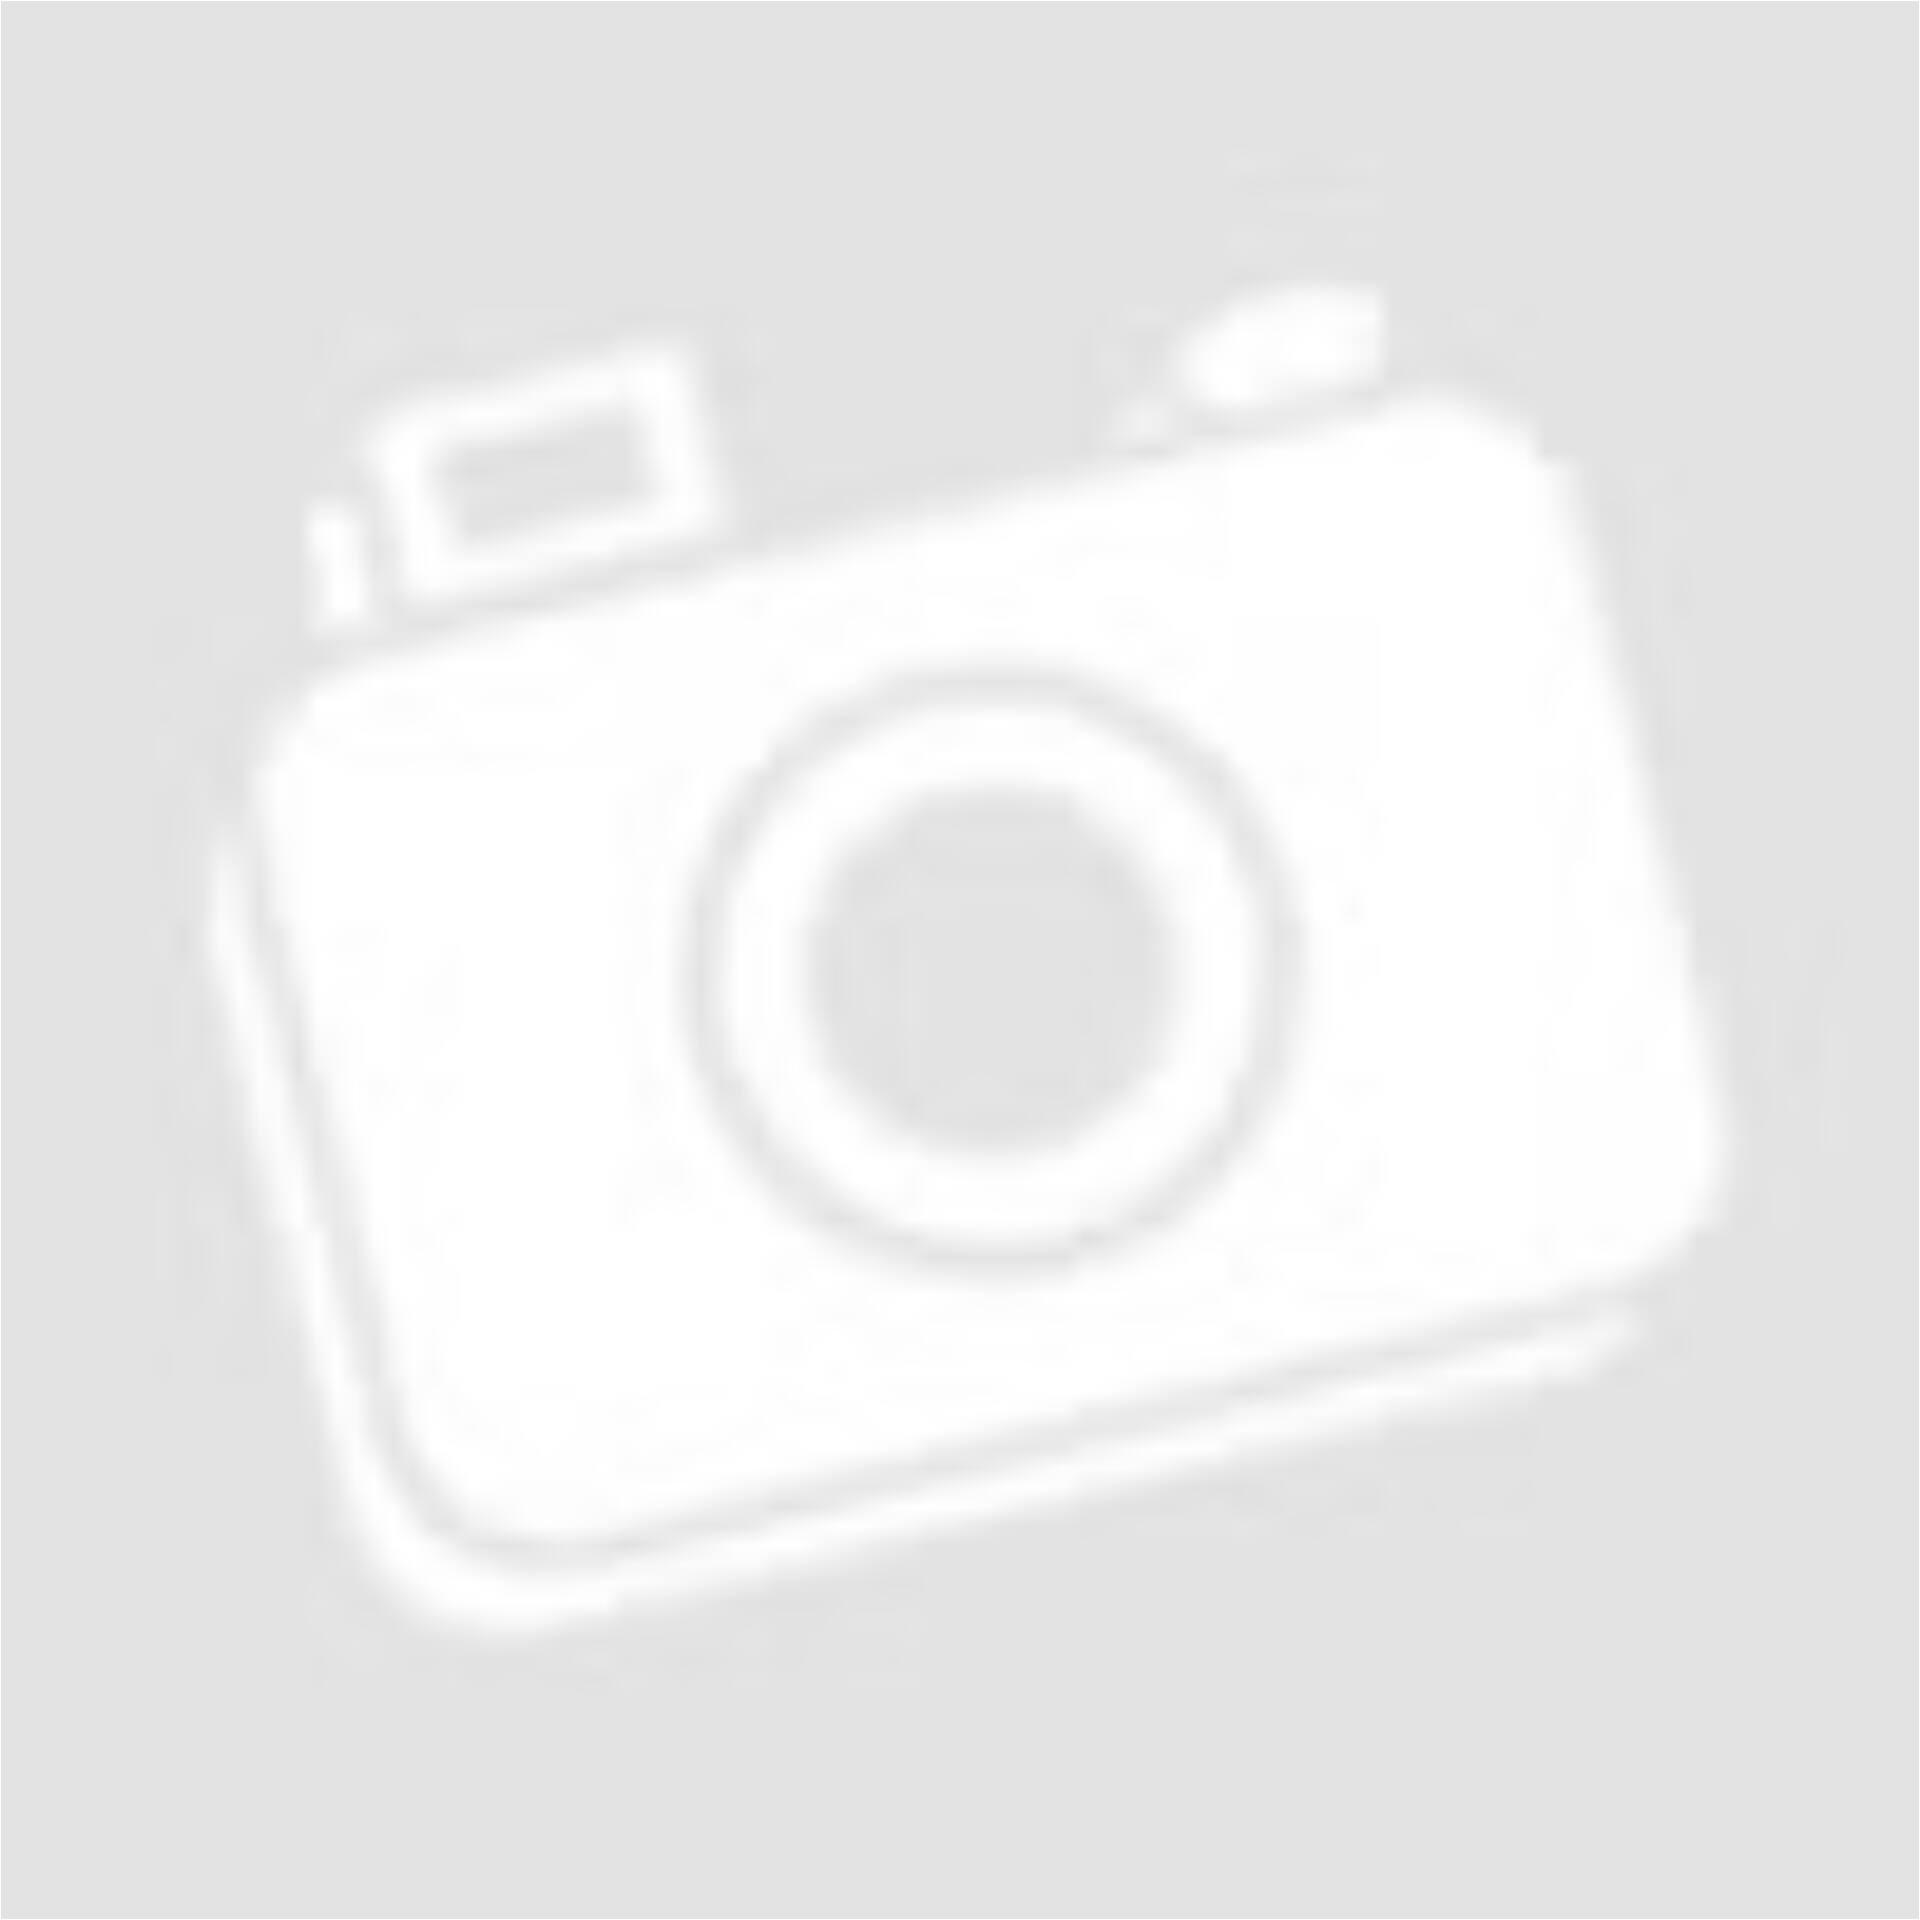 fc45f3dec4 FITT ORIGINAL fekete színű gumis derekú nadrág (Méret: S) - Farmer ...